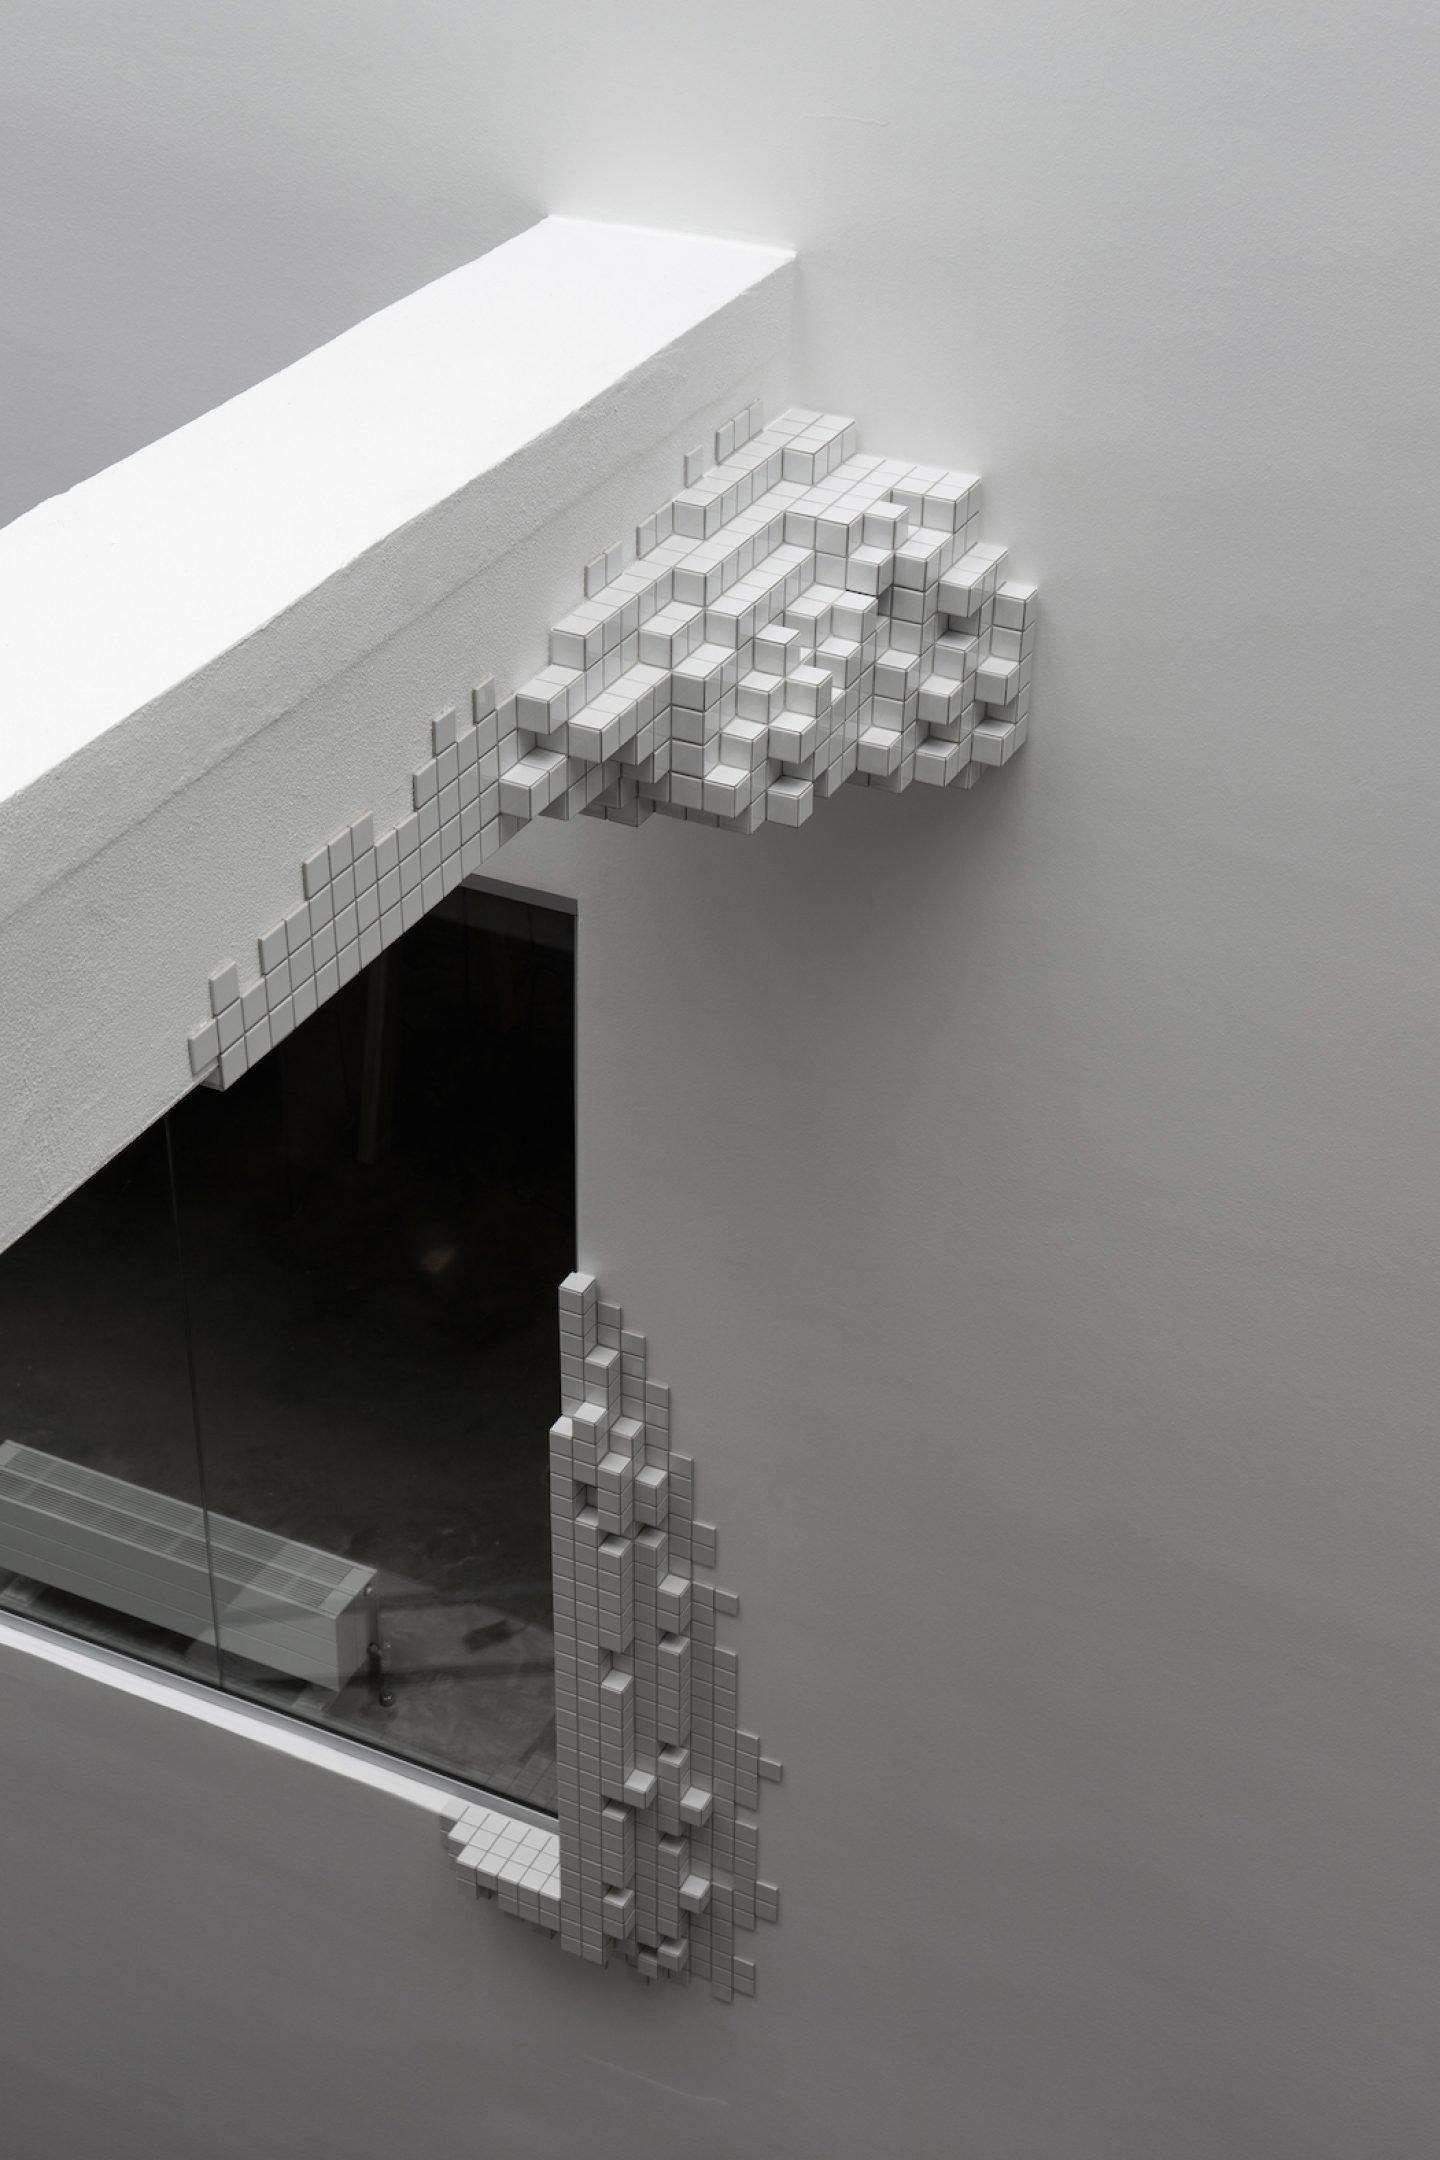 art_borgmannlenk_mos_installation_09